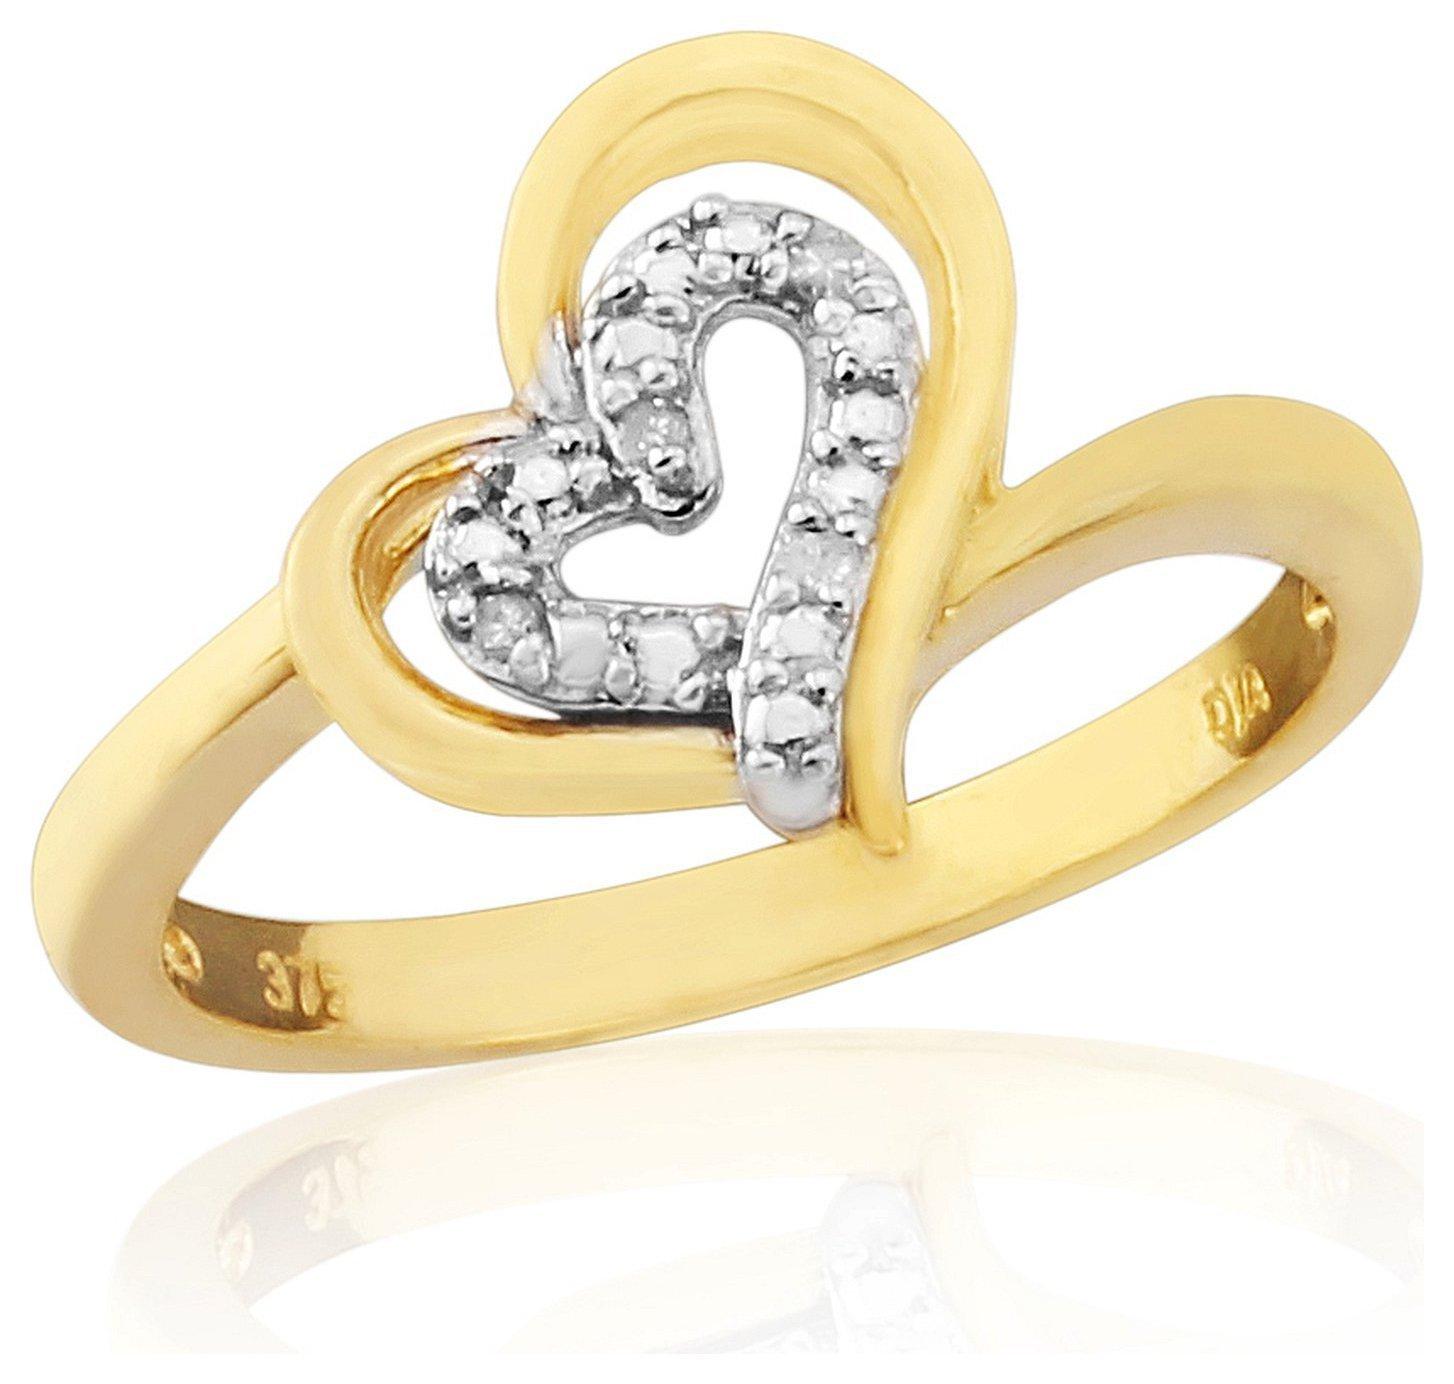 Buy 9ct Gold Diamond Set Heart Dress Ring Size O at Argos